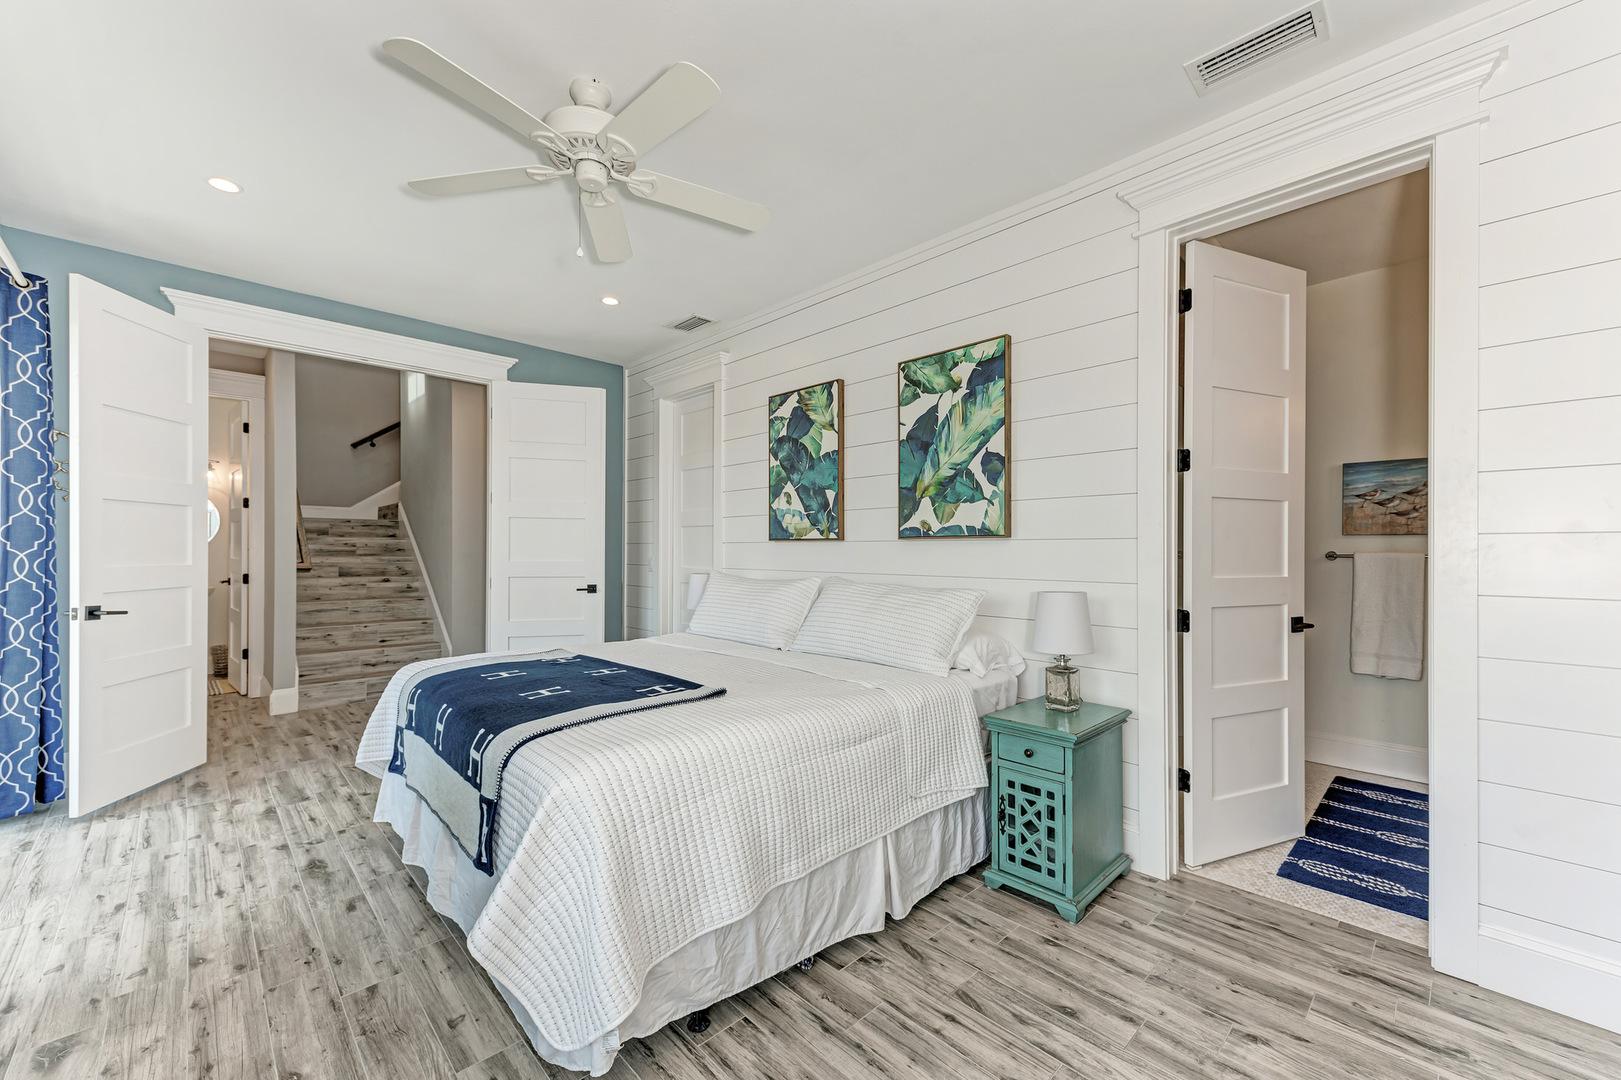 4 Sandpipers master bedroom alternate view